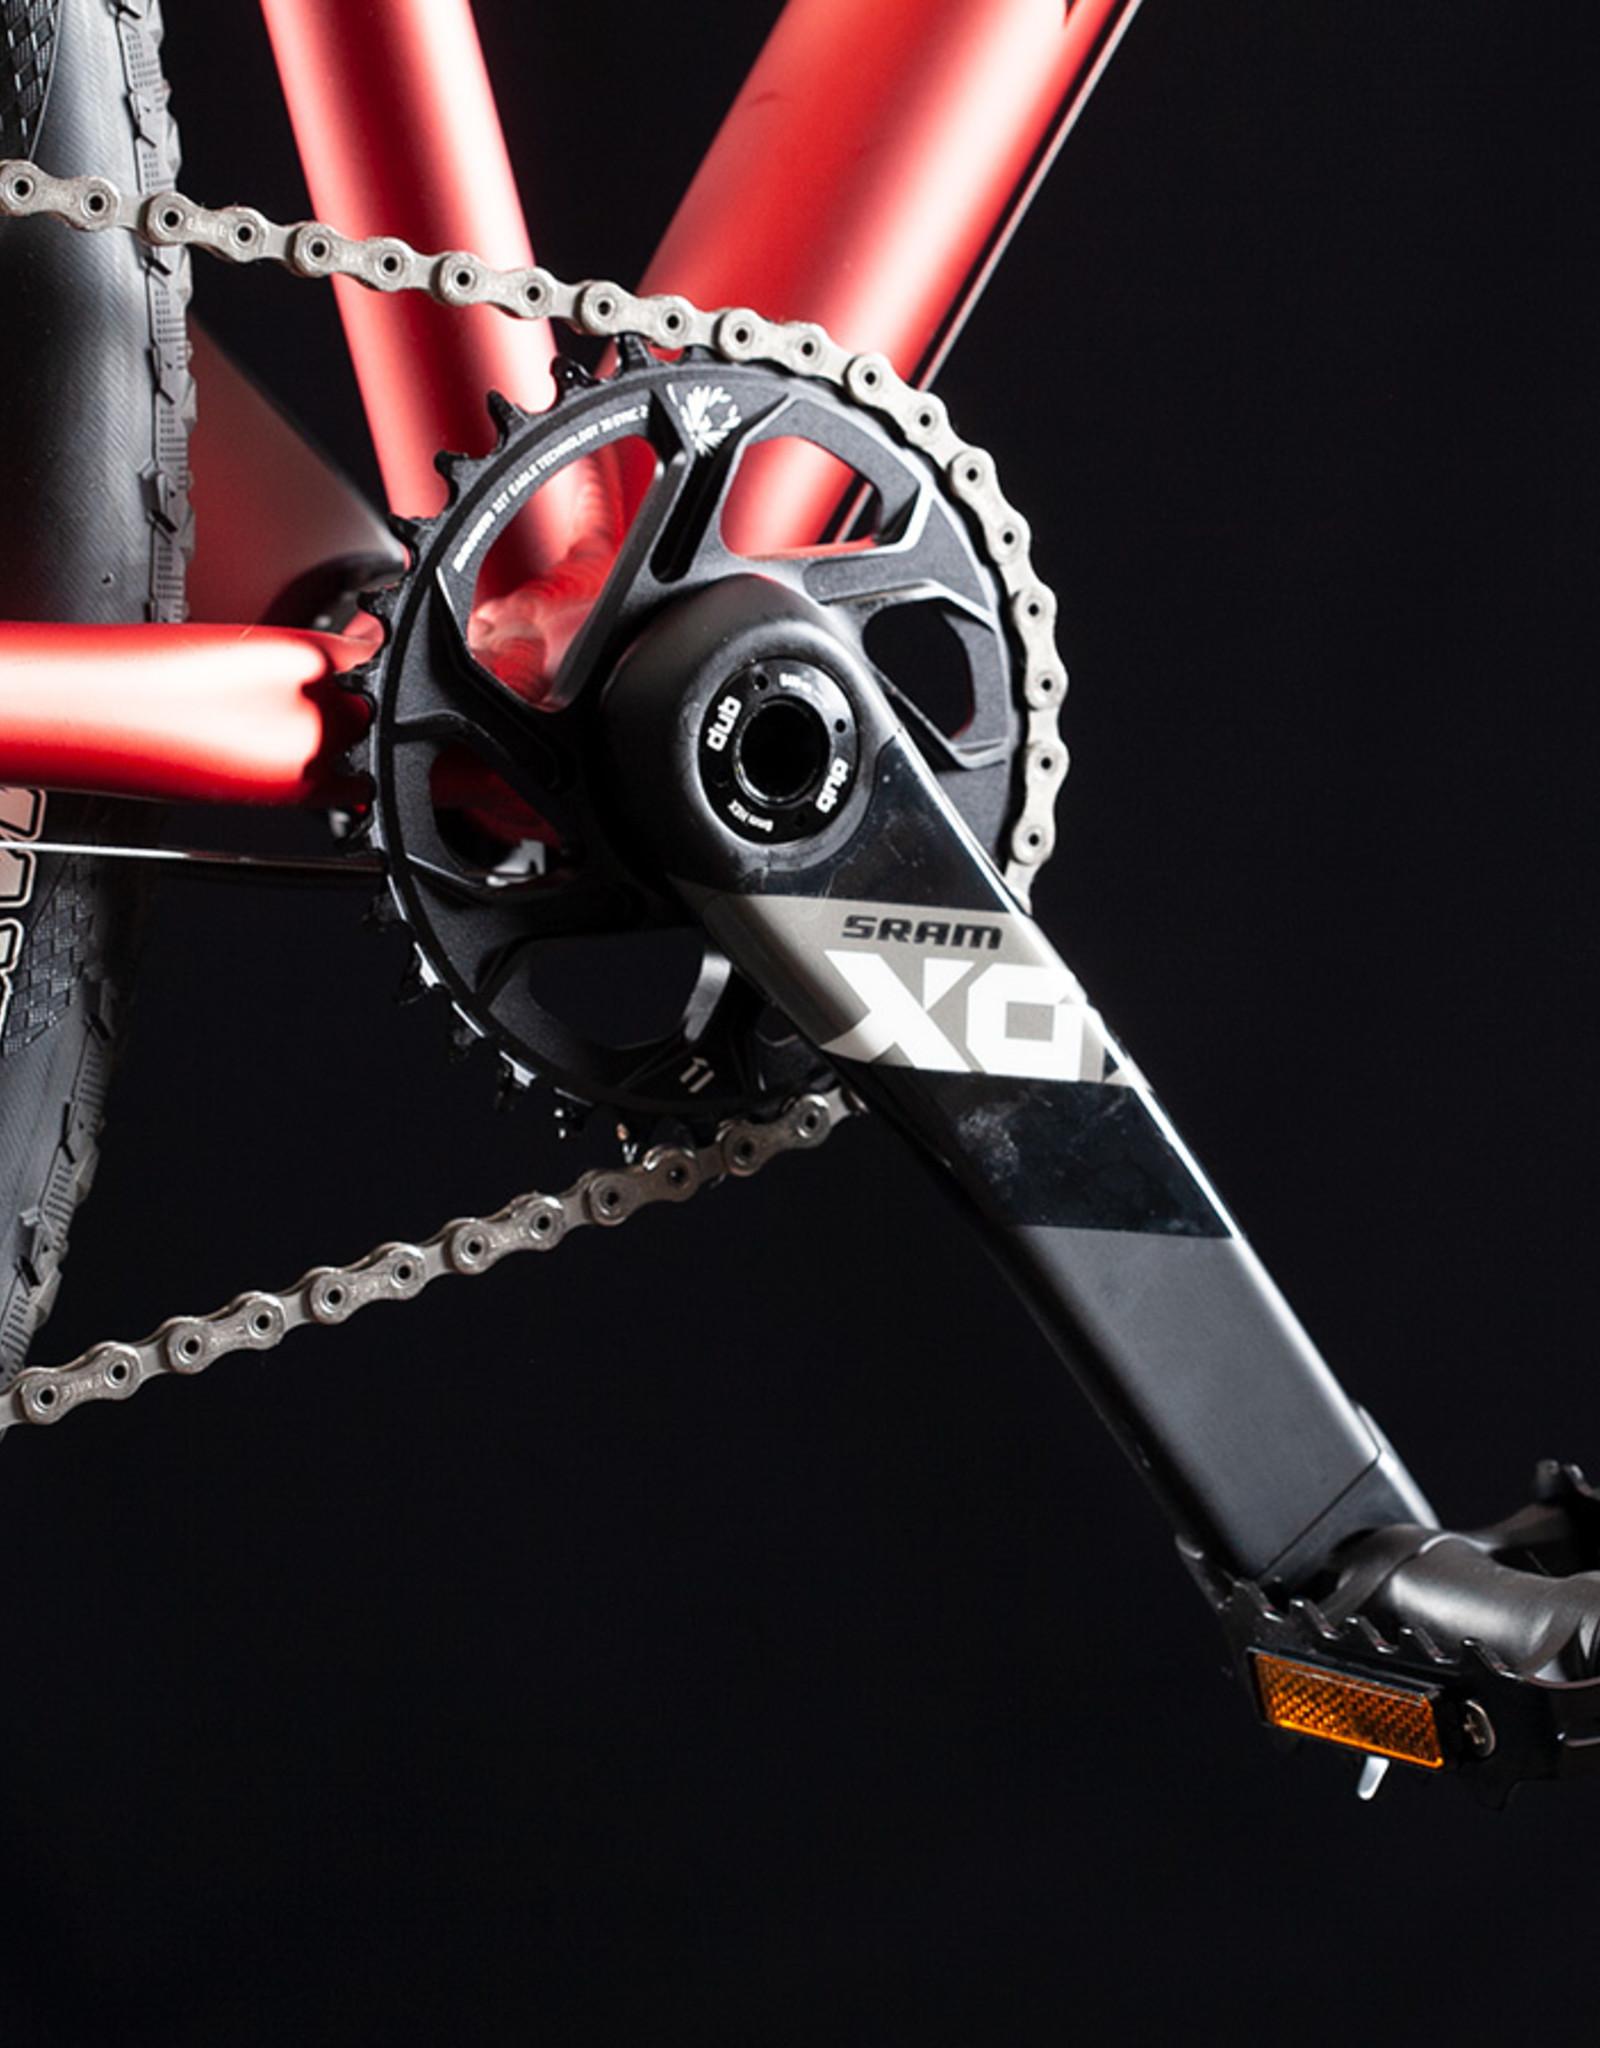 New Motobecane Fly AL SL Mountain Bike 29er Hard Tail, Eagle XO1 Size Small